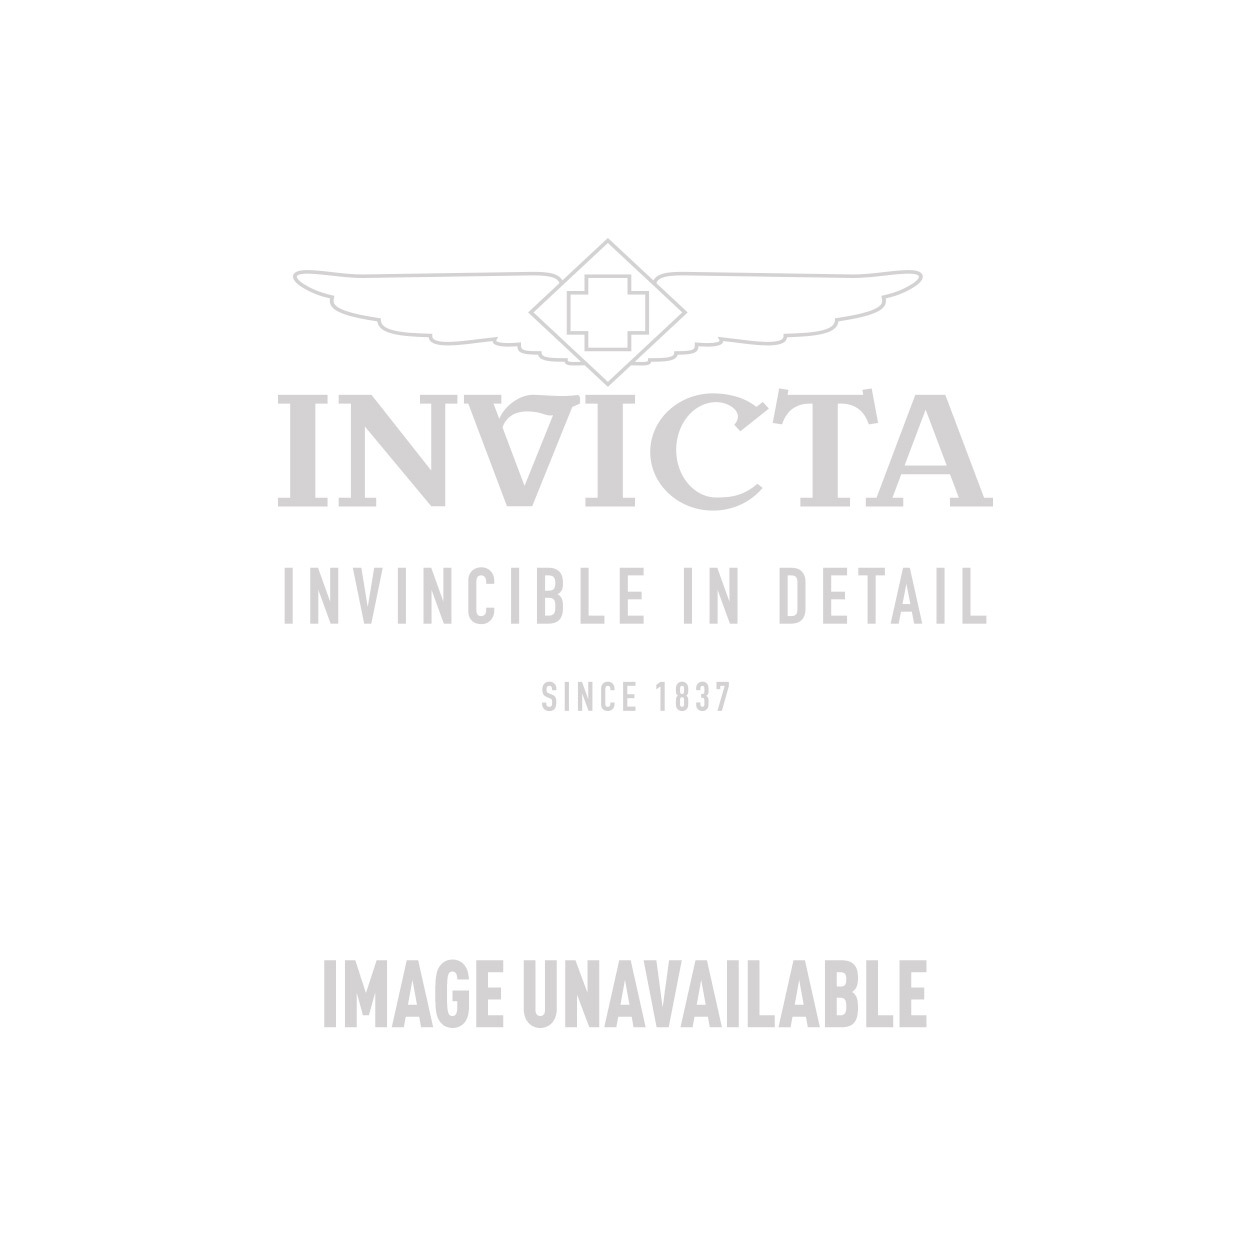 Invicta I-Force Swiss Movement Quartz Watch - Black case with Black tone Stainless Steel, Polyurethane band - Model 19662